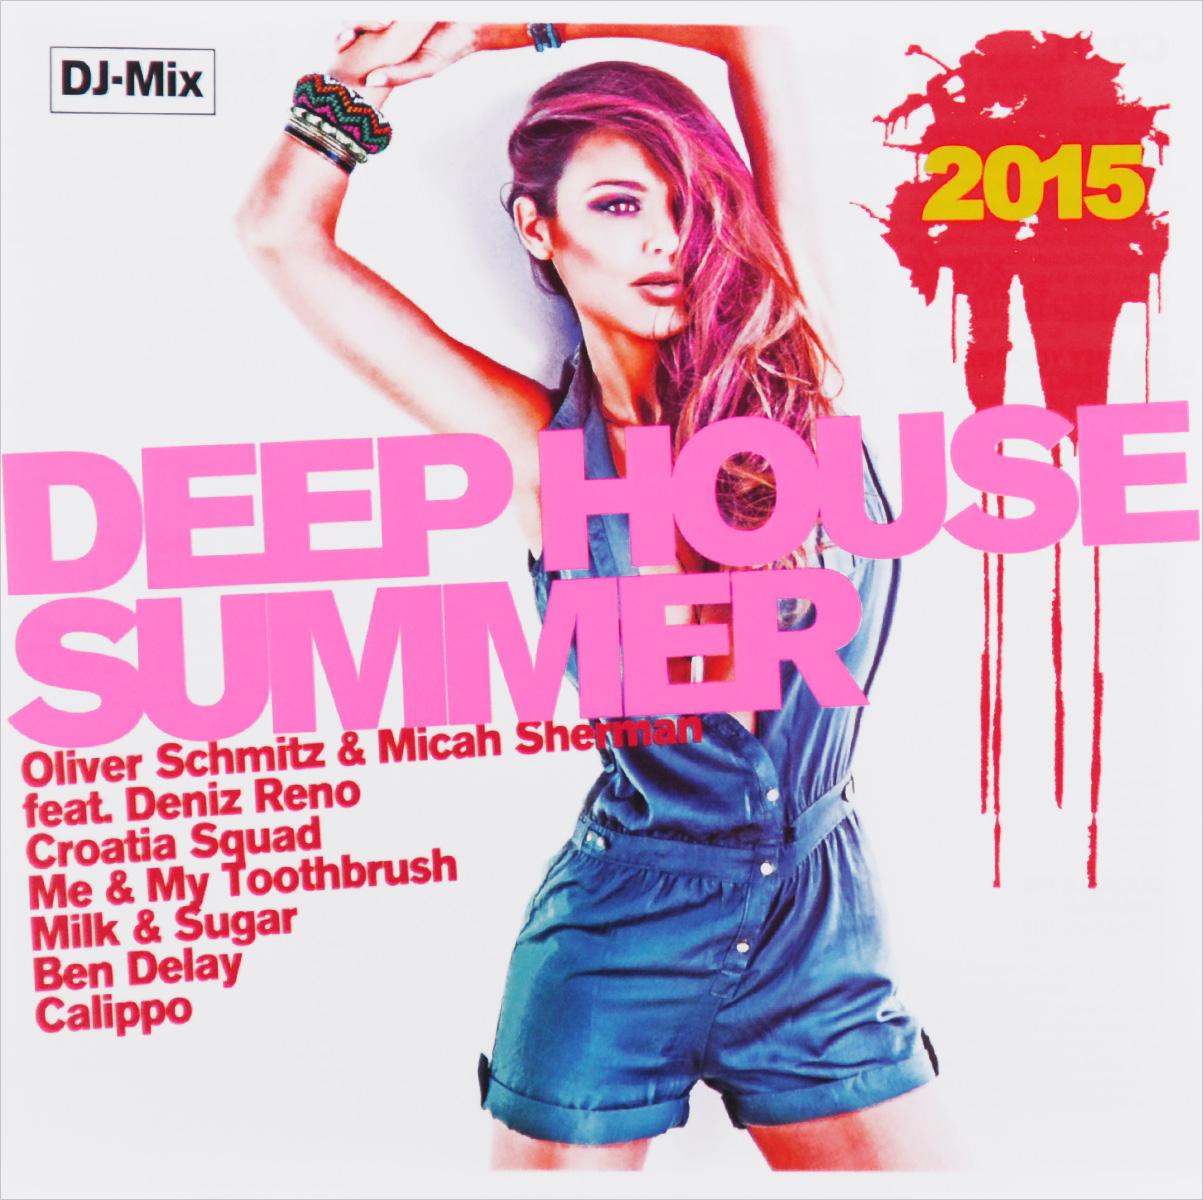 Deep House Summer 2015 (2 CD) 2 Audio CD